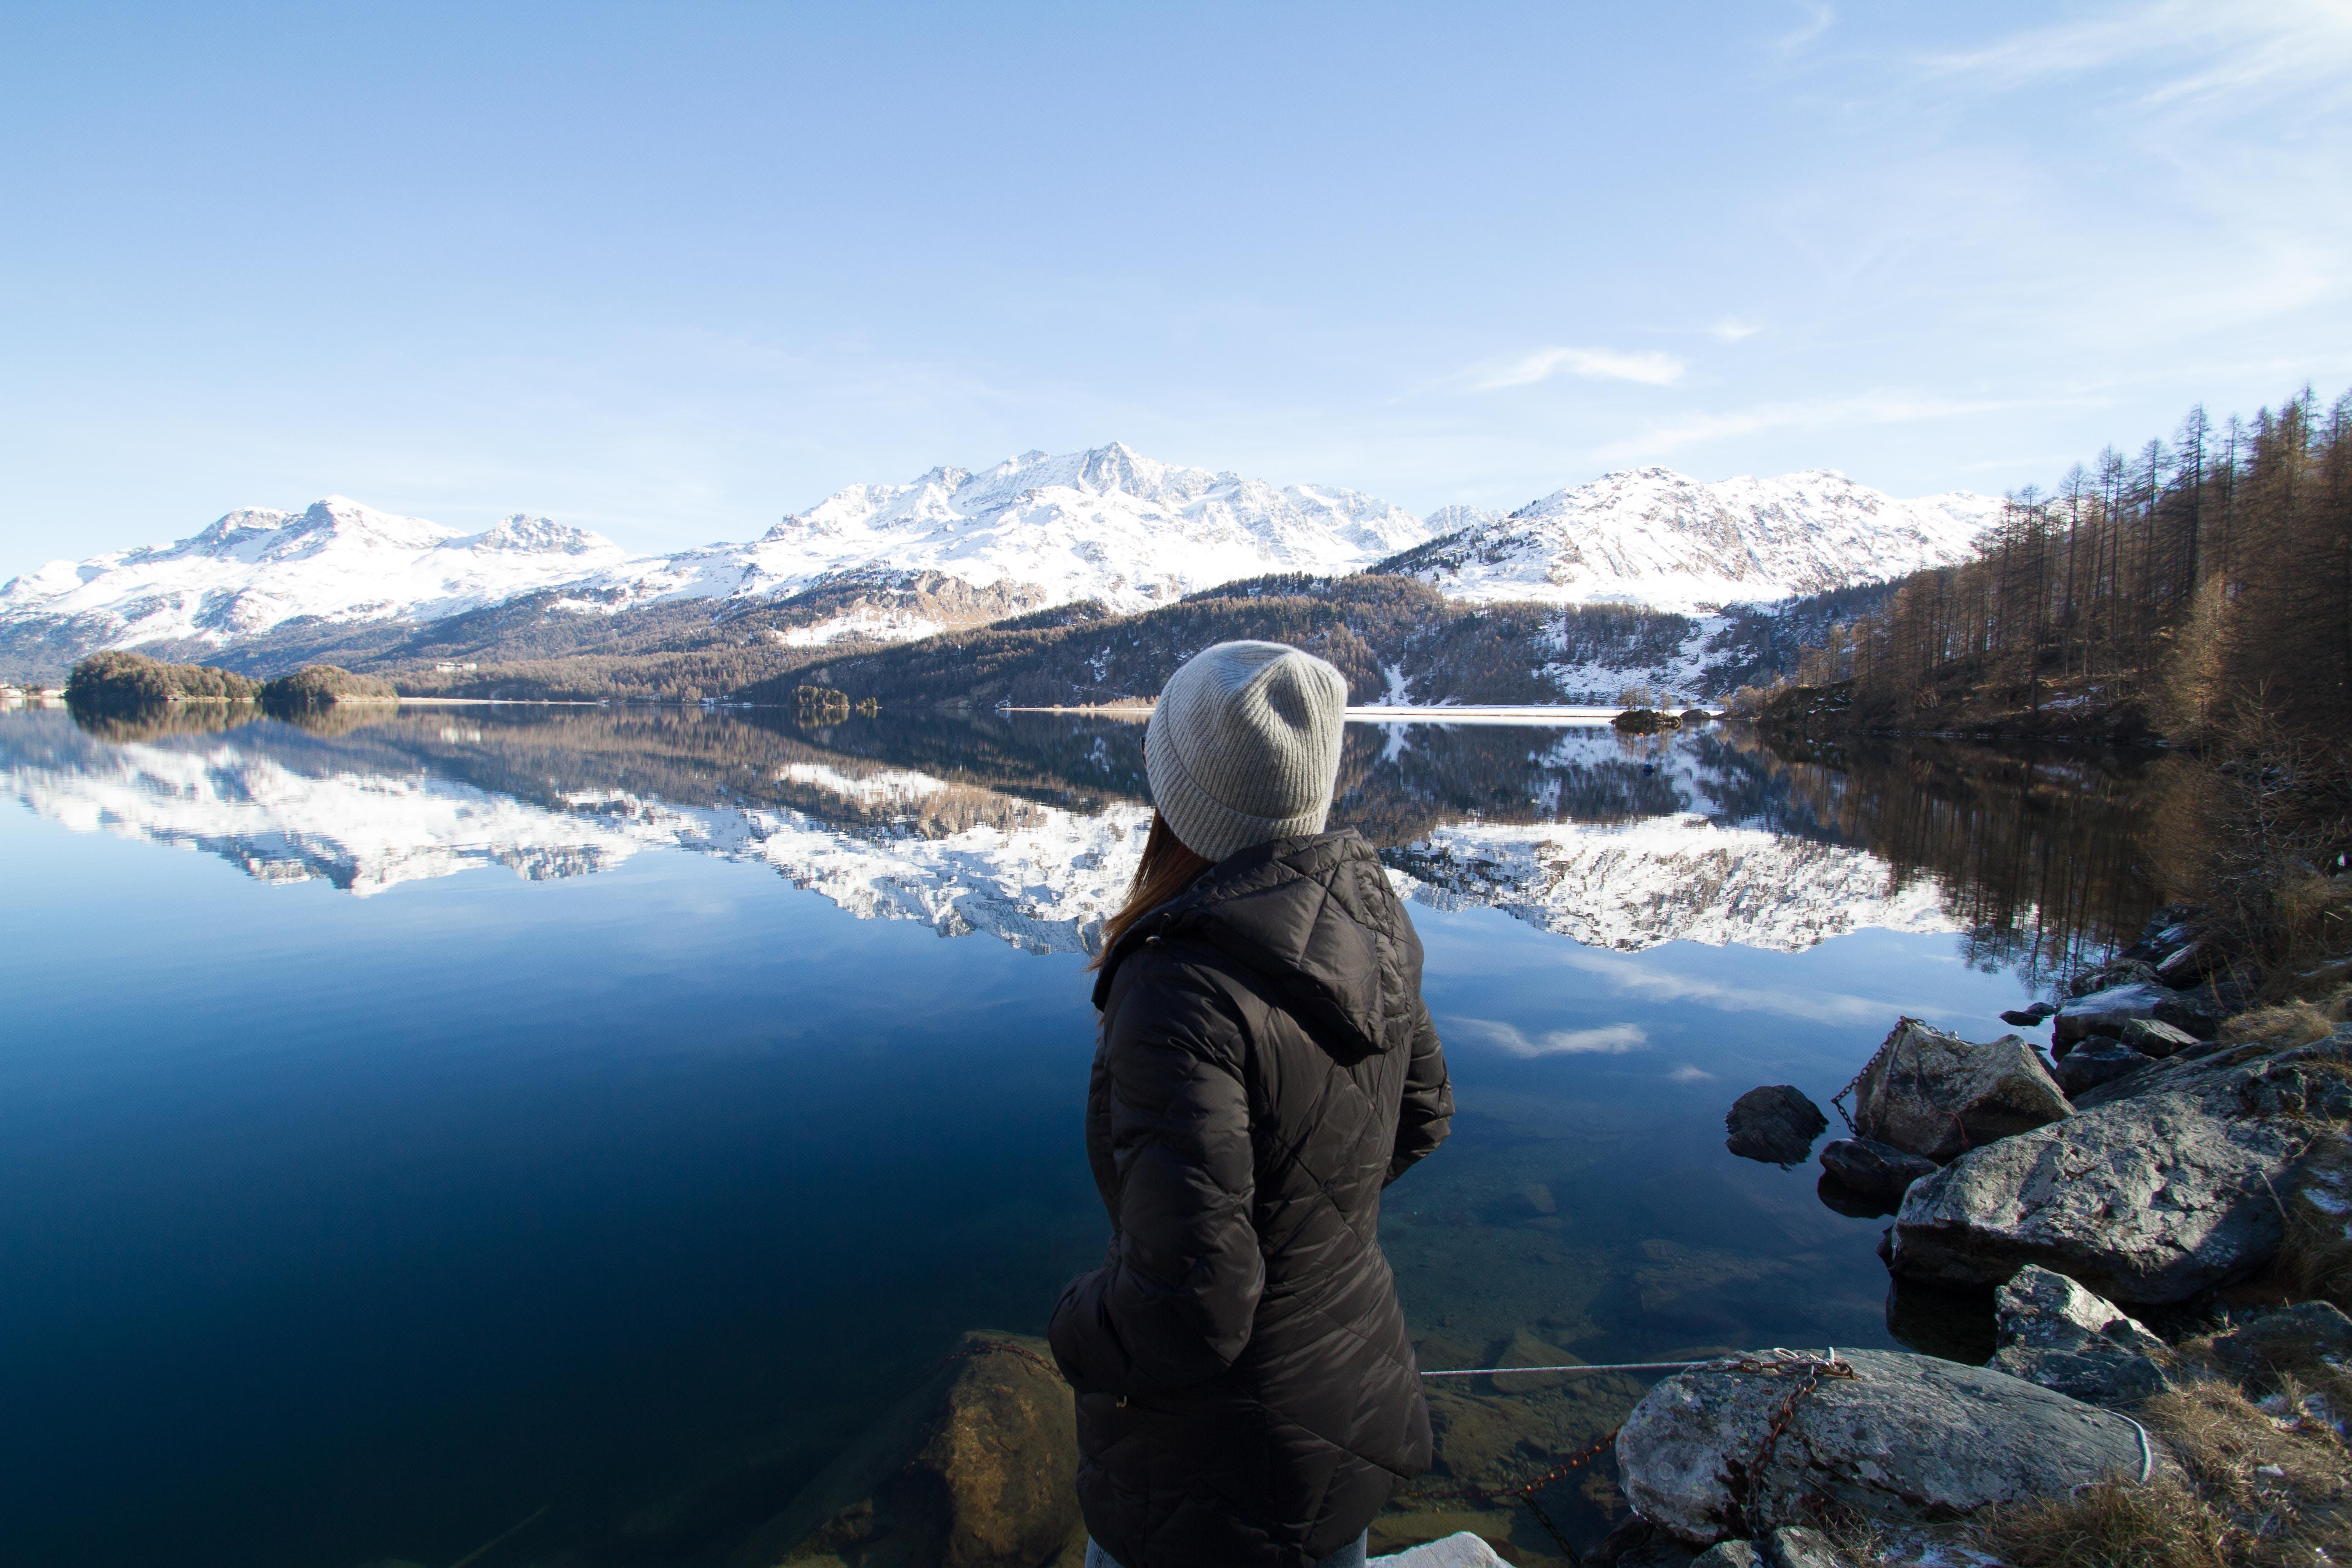 Woman Wearing Black Hooded Jacket Watching Mountain